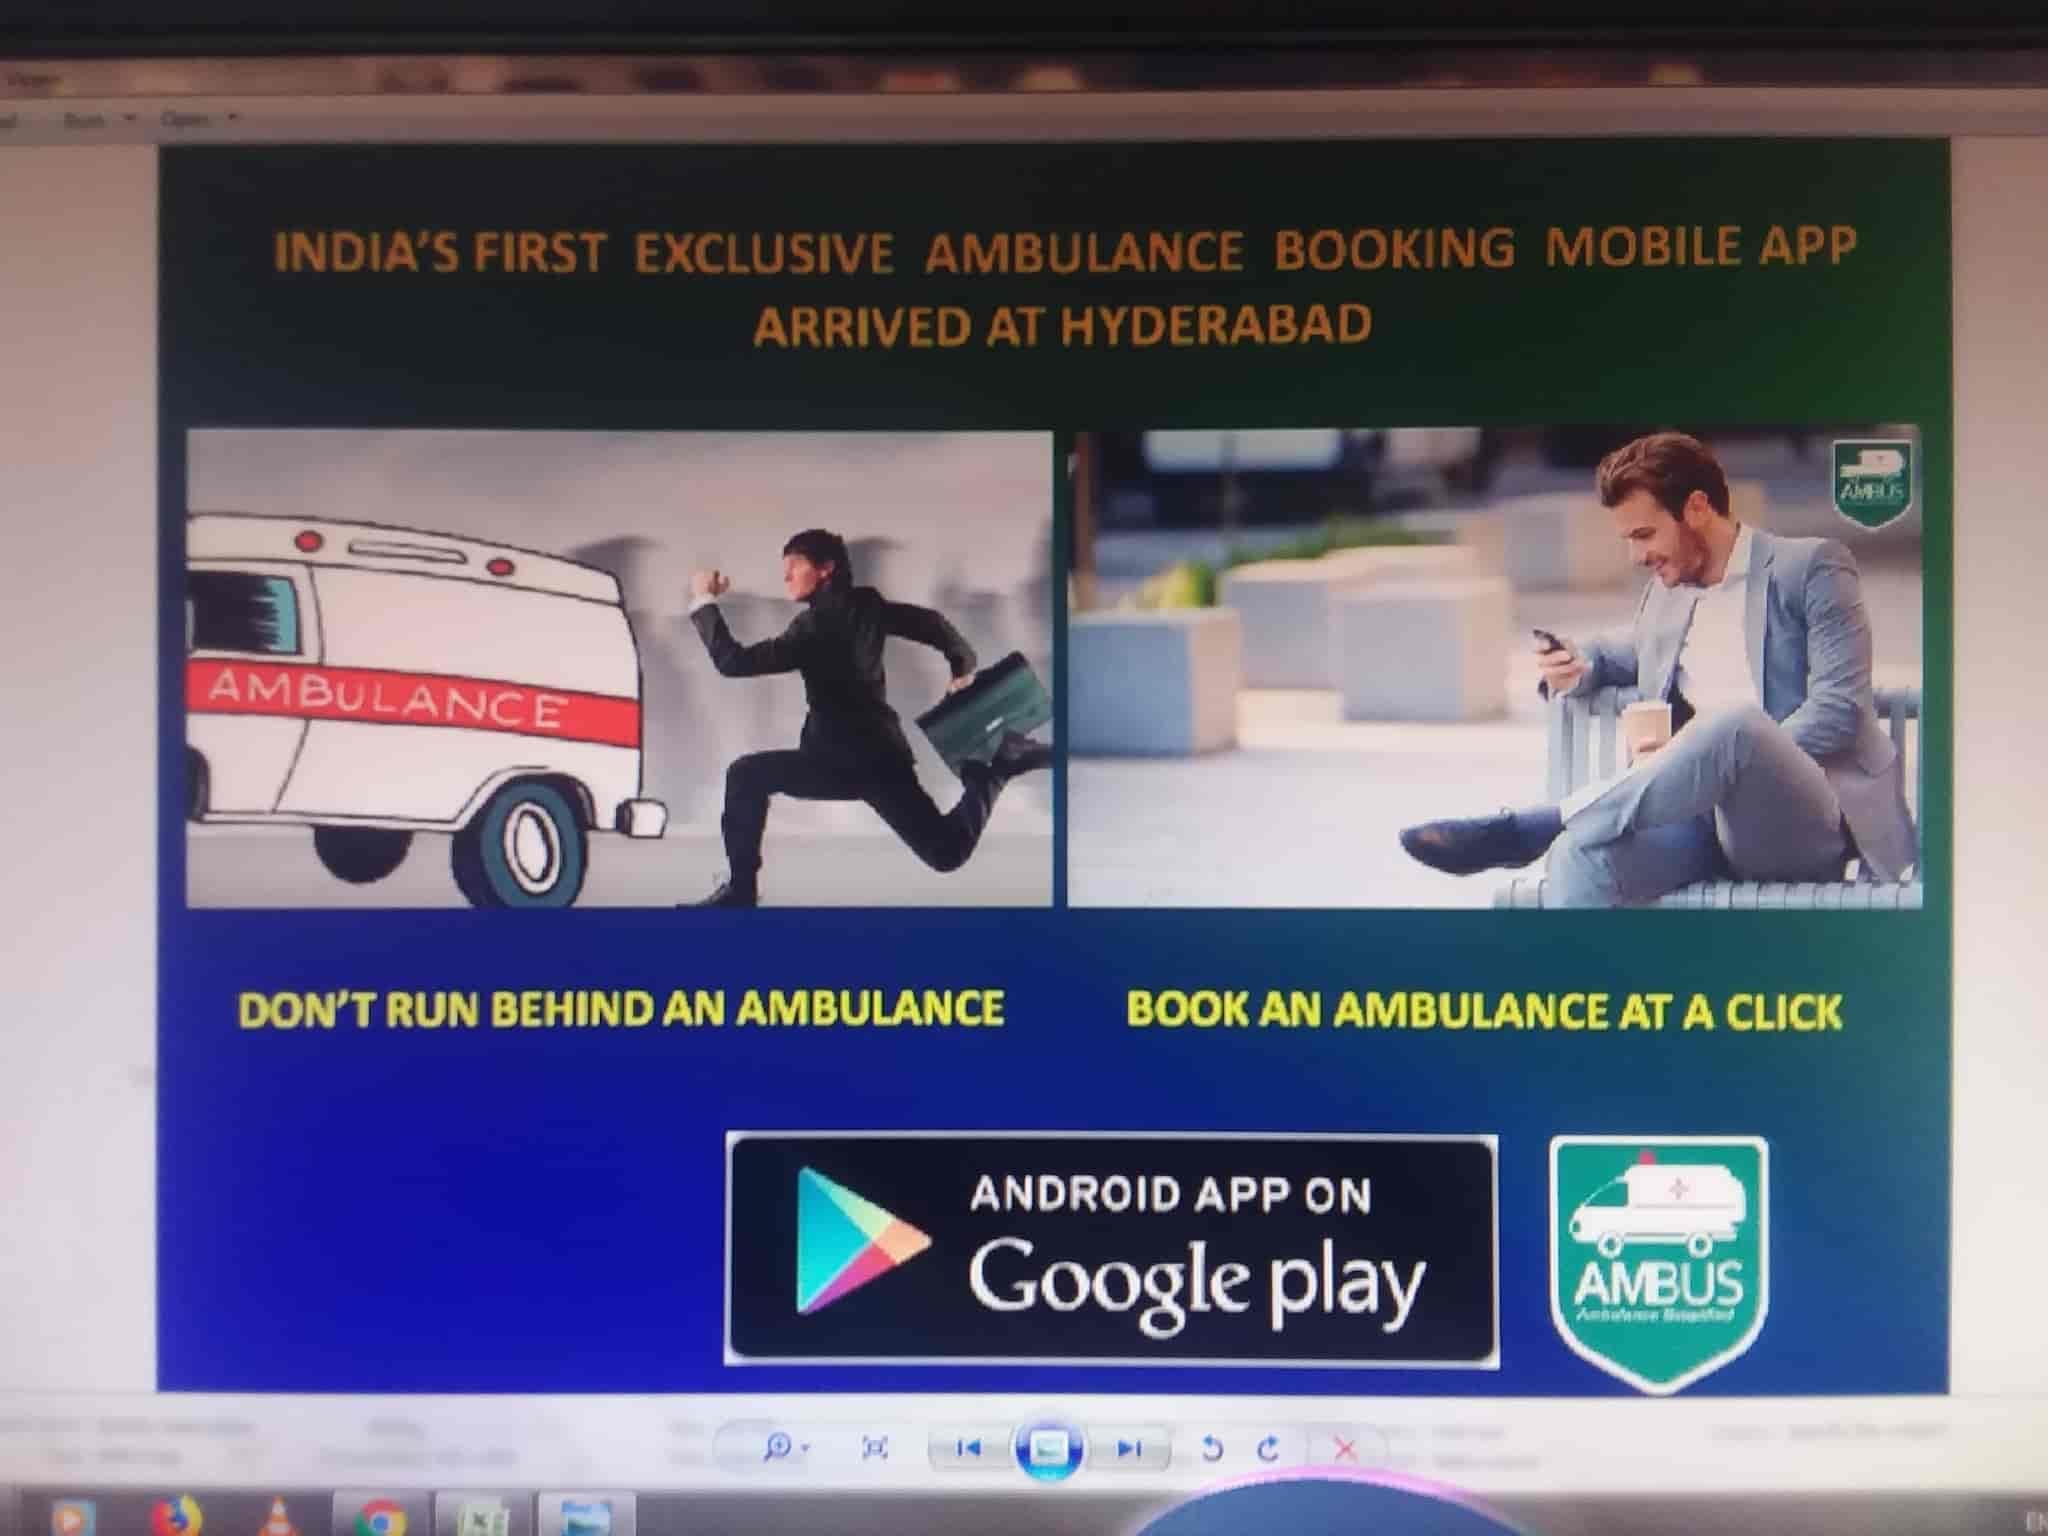 Ambus Ambulance Booking Mobile App, RTC X Roads - Ambulance Services